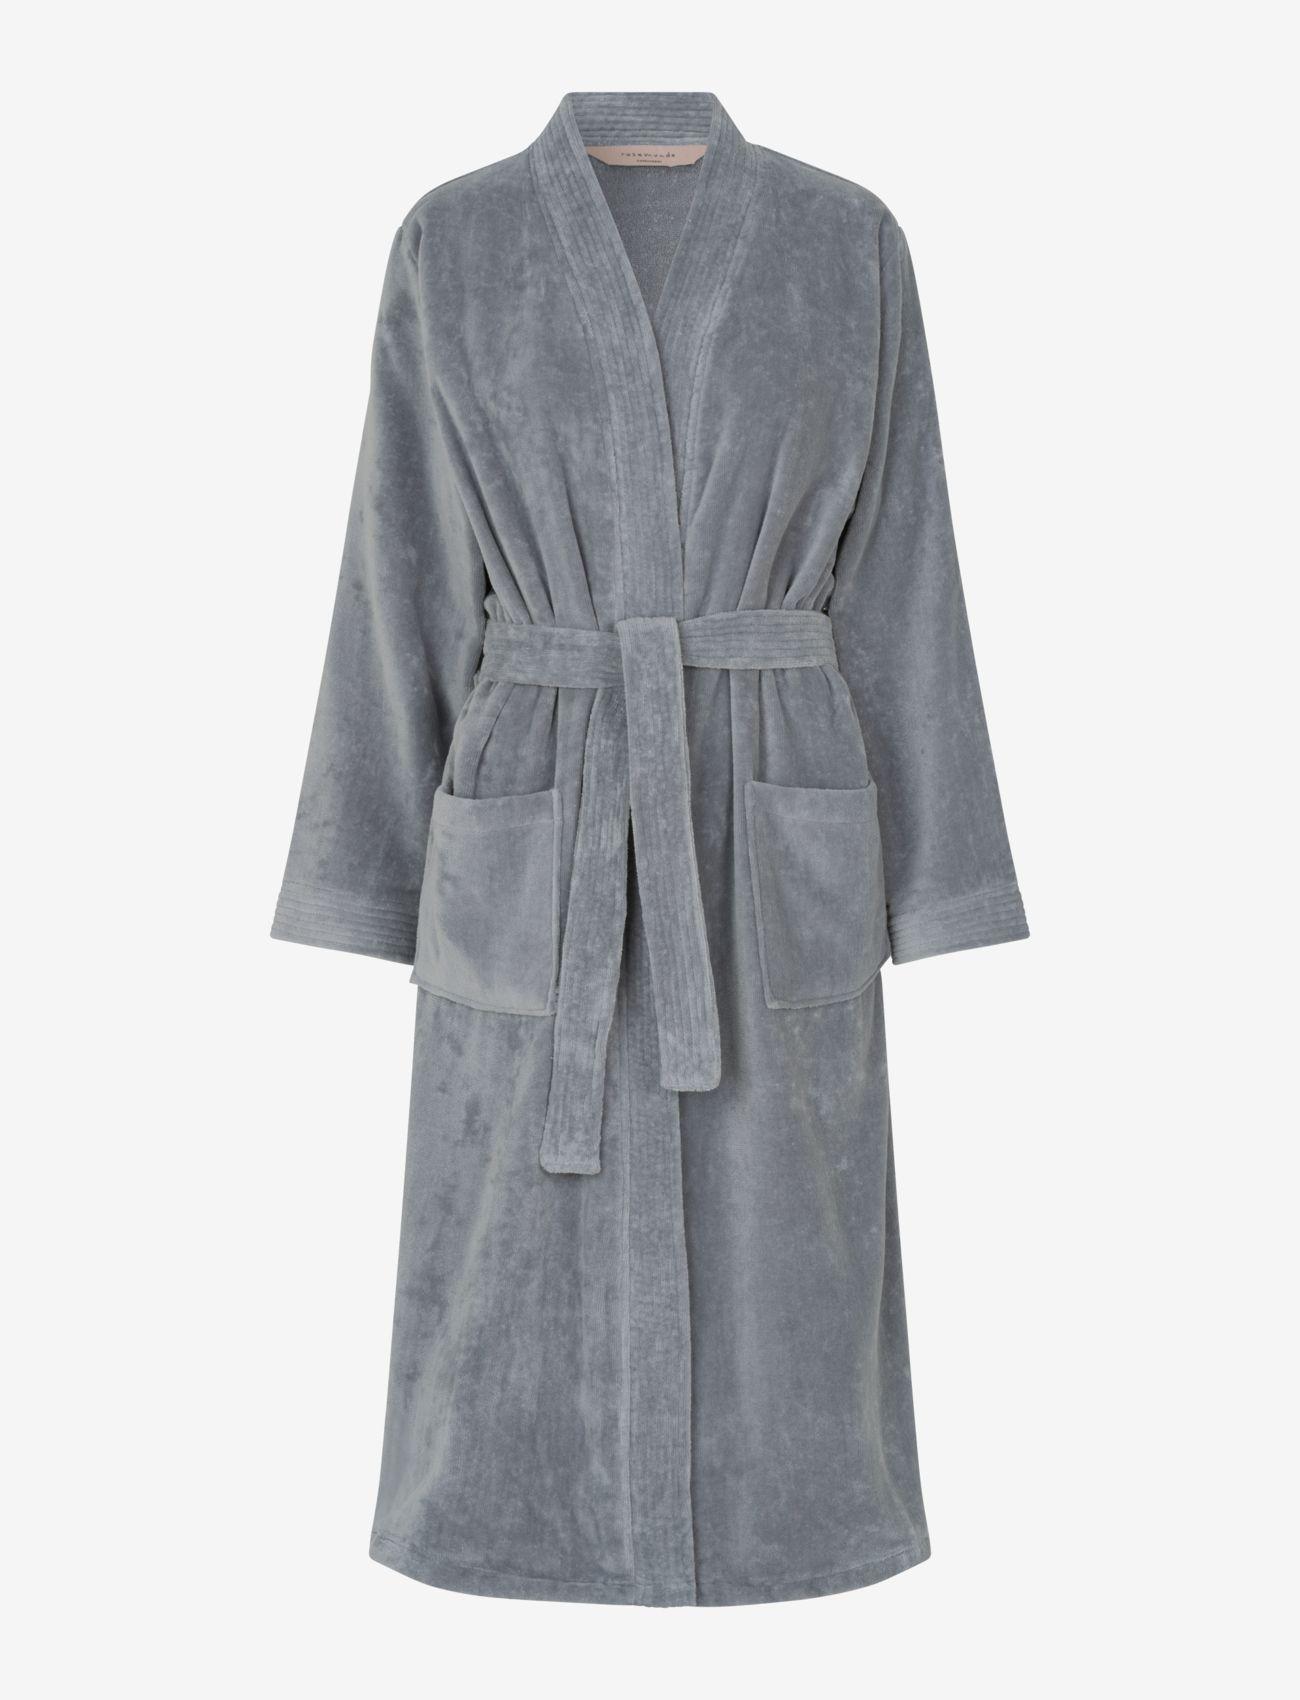 Rosemunde - robe - pegnoirs - charcoal grey - 0